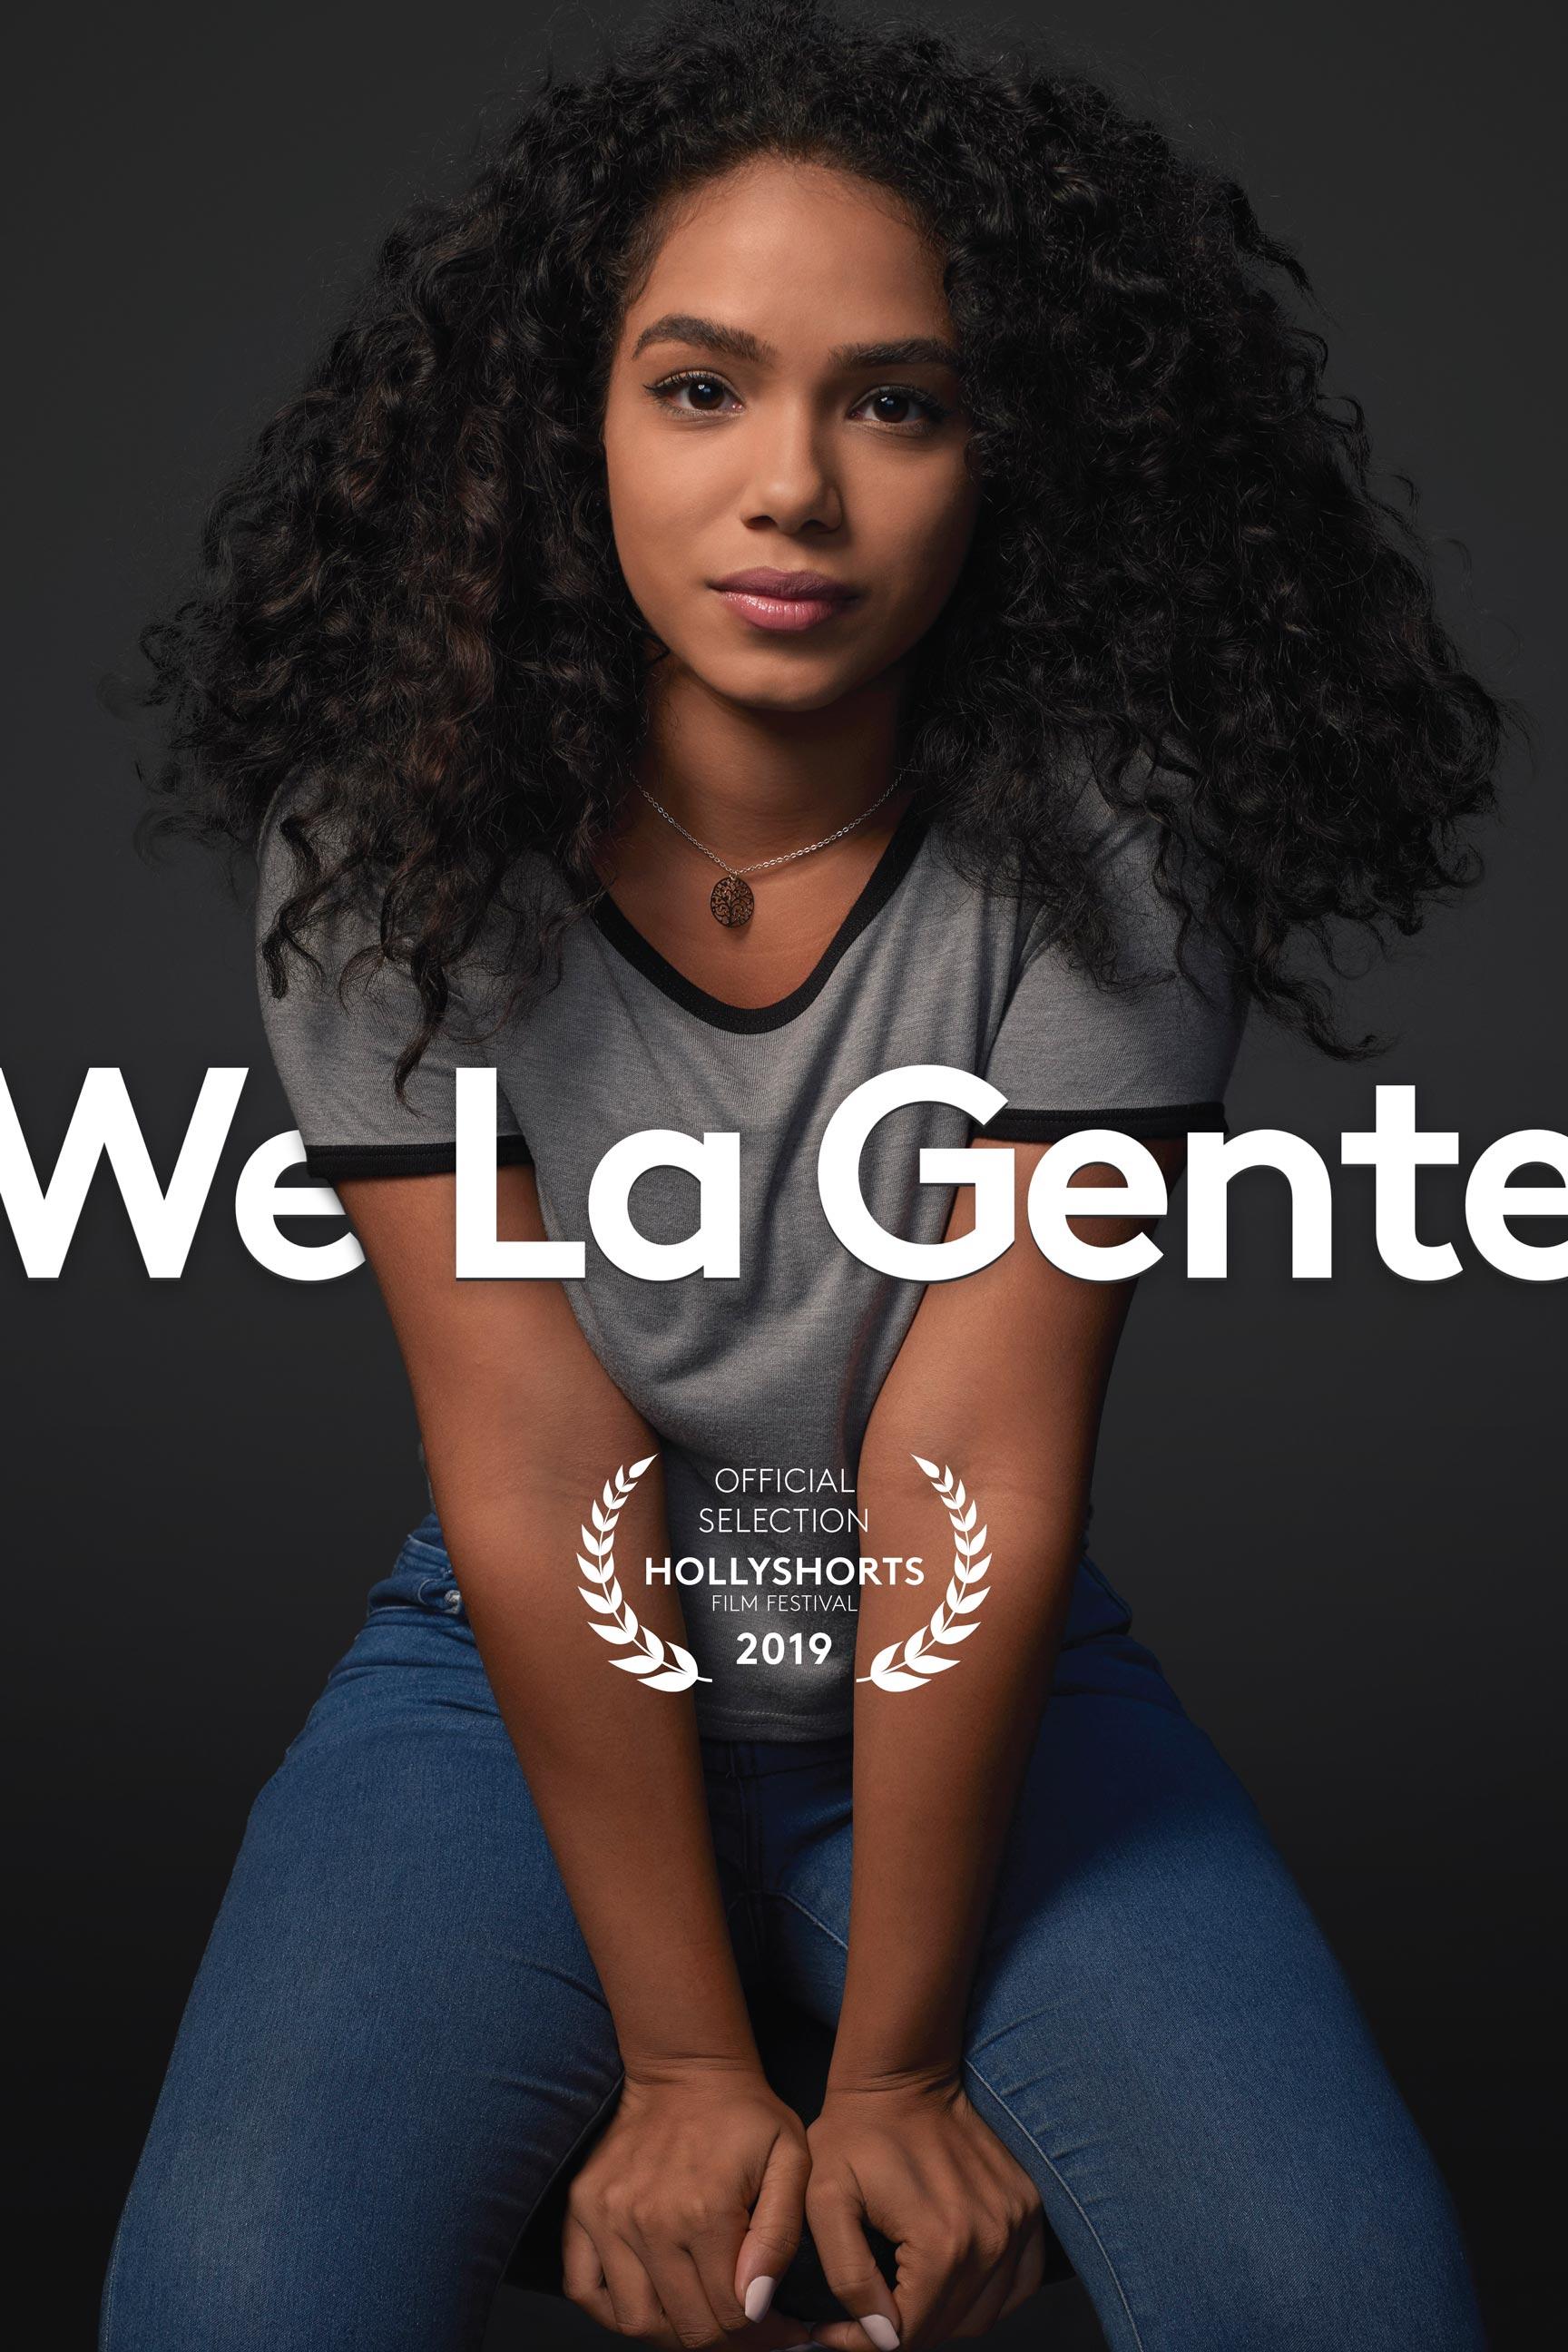 #WeLaGente poster